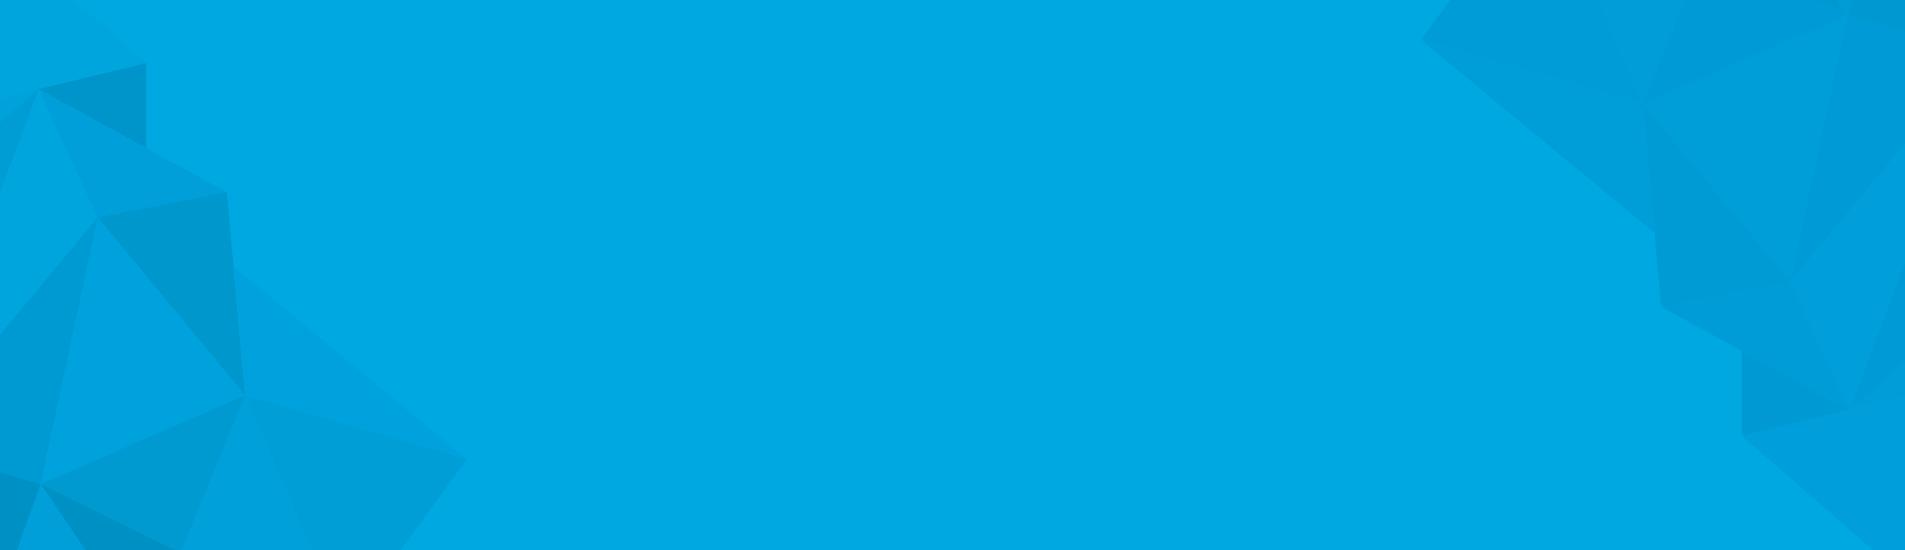 Reprofast fondo azul